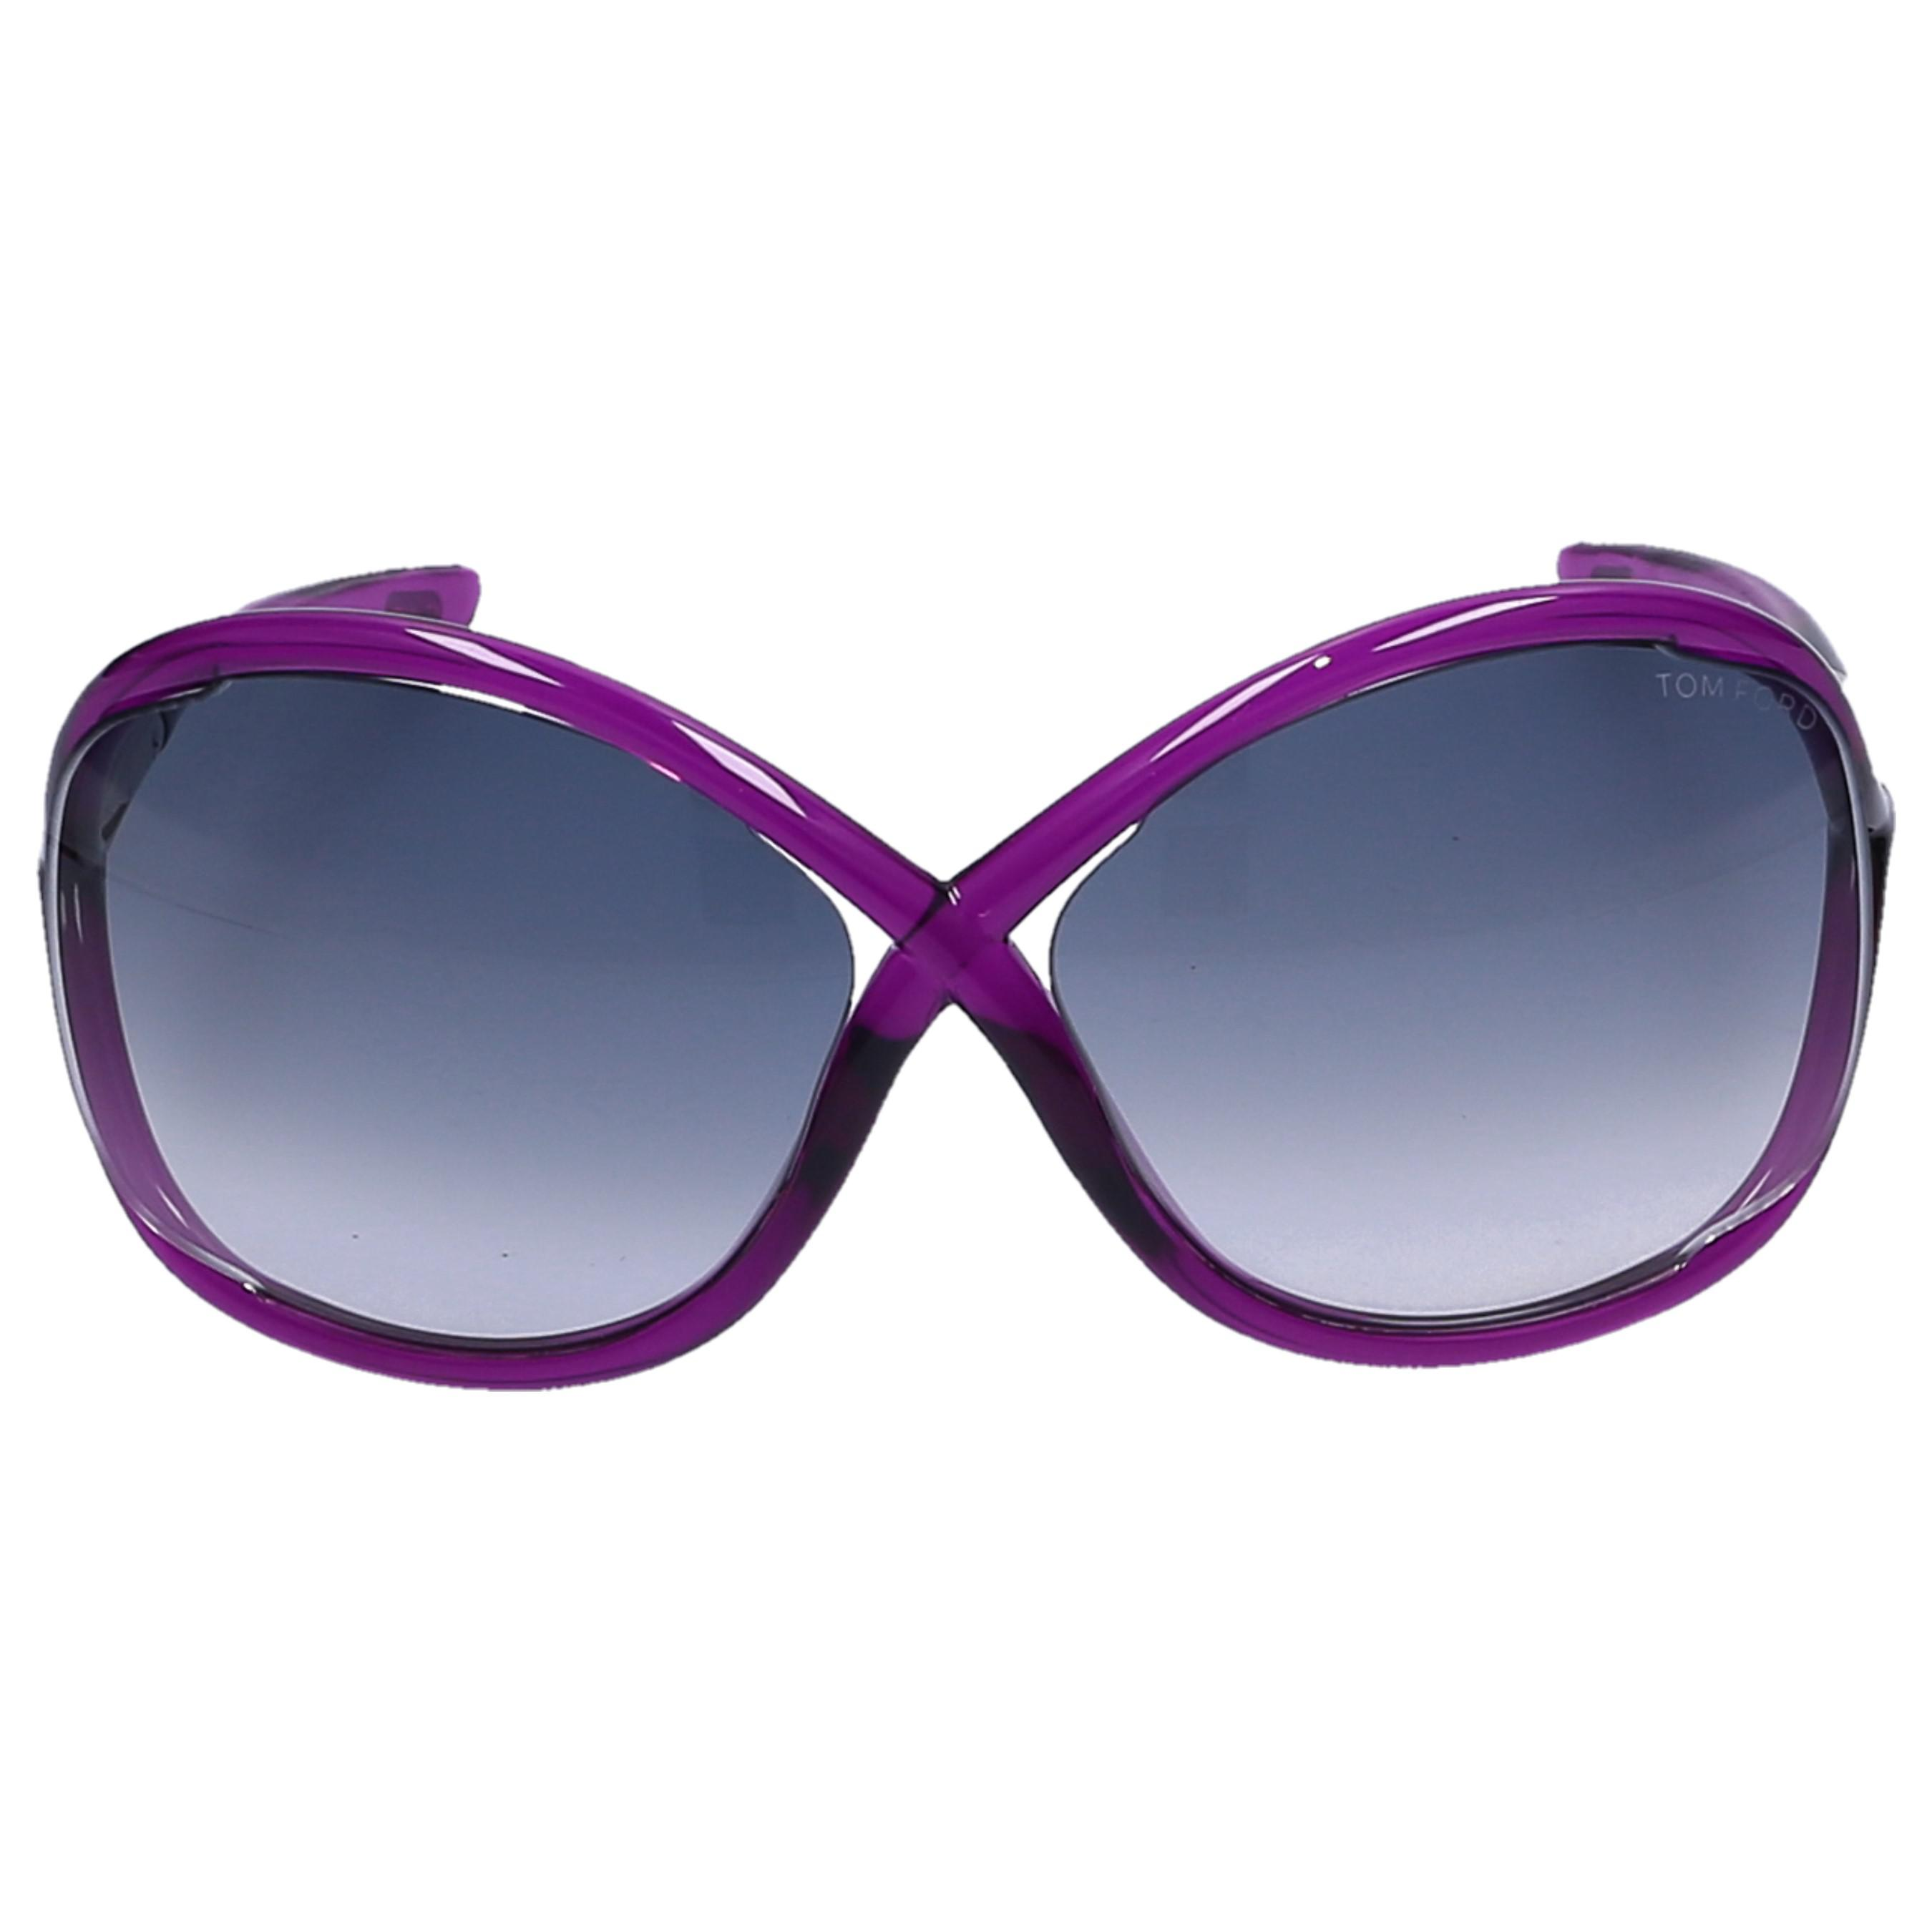 98c28e56ab7 Lyst - Tom Ford Sunglasses Oversize 9 Acetate Purple in Blue